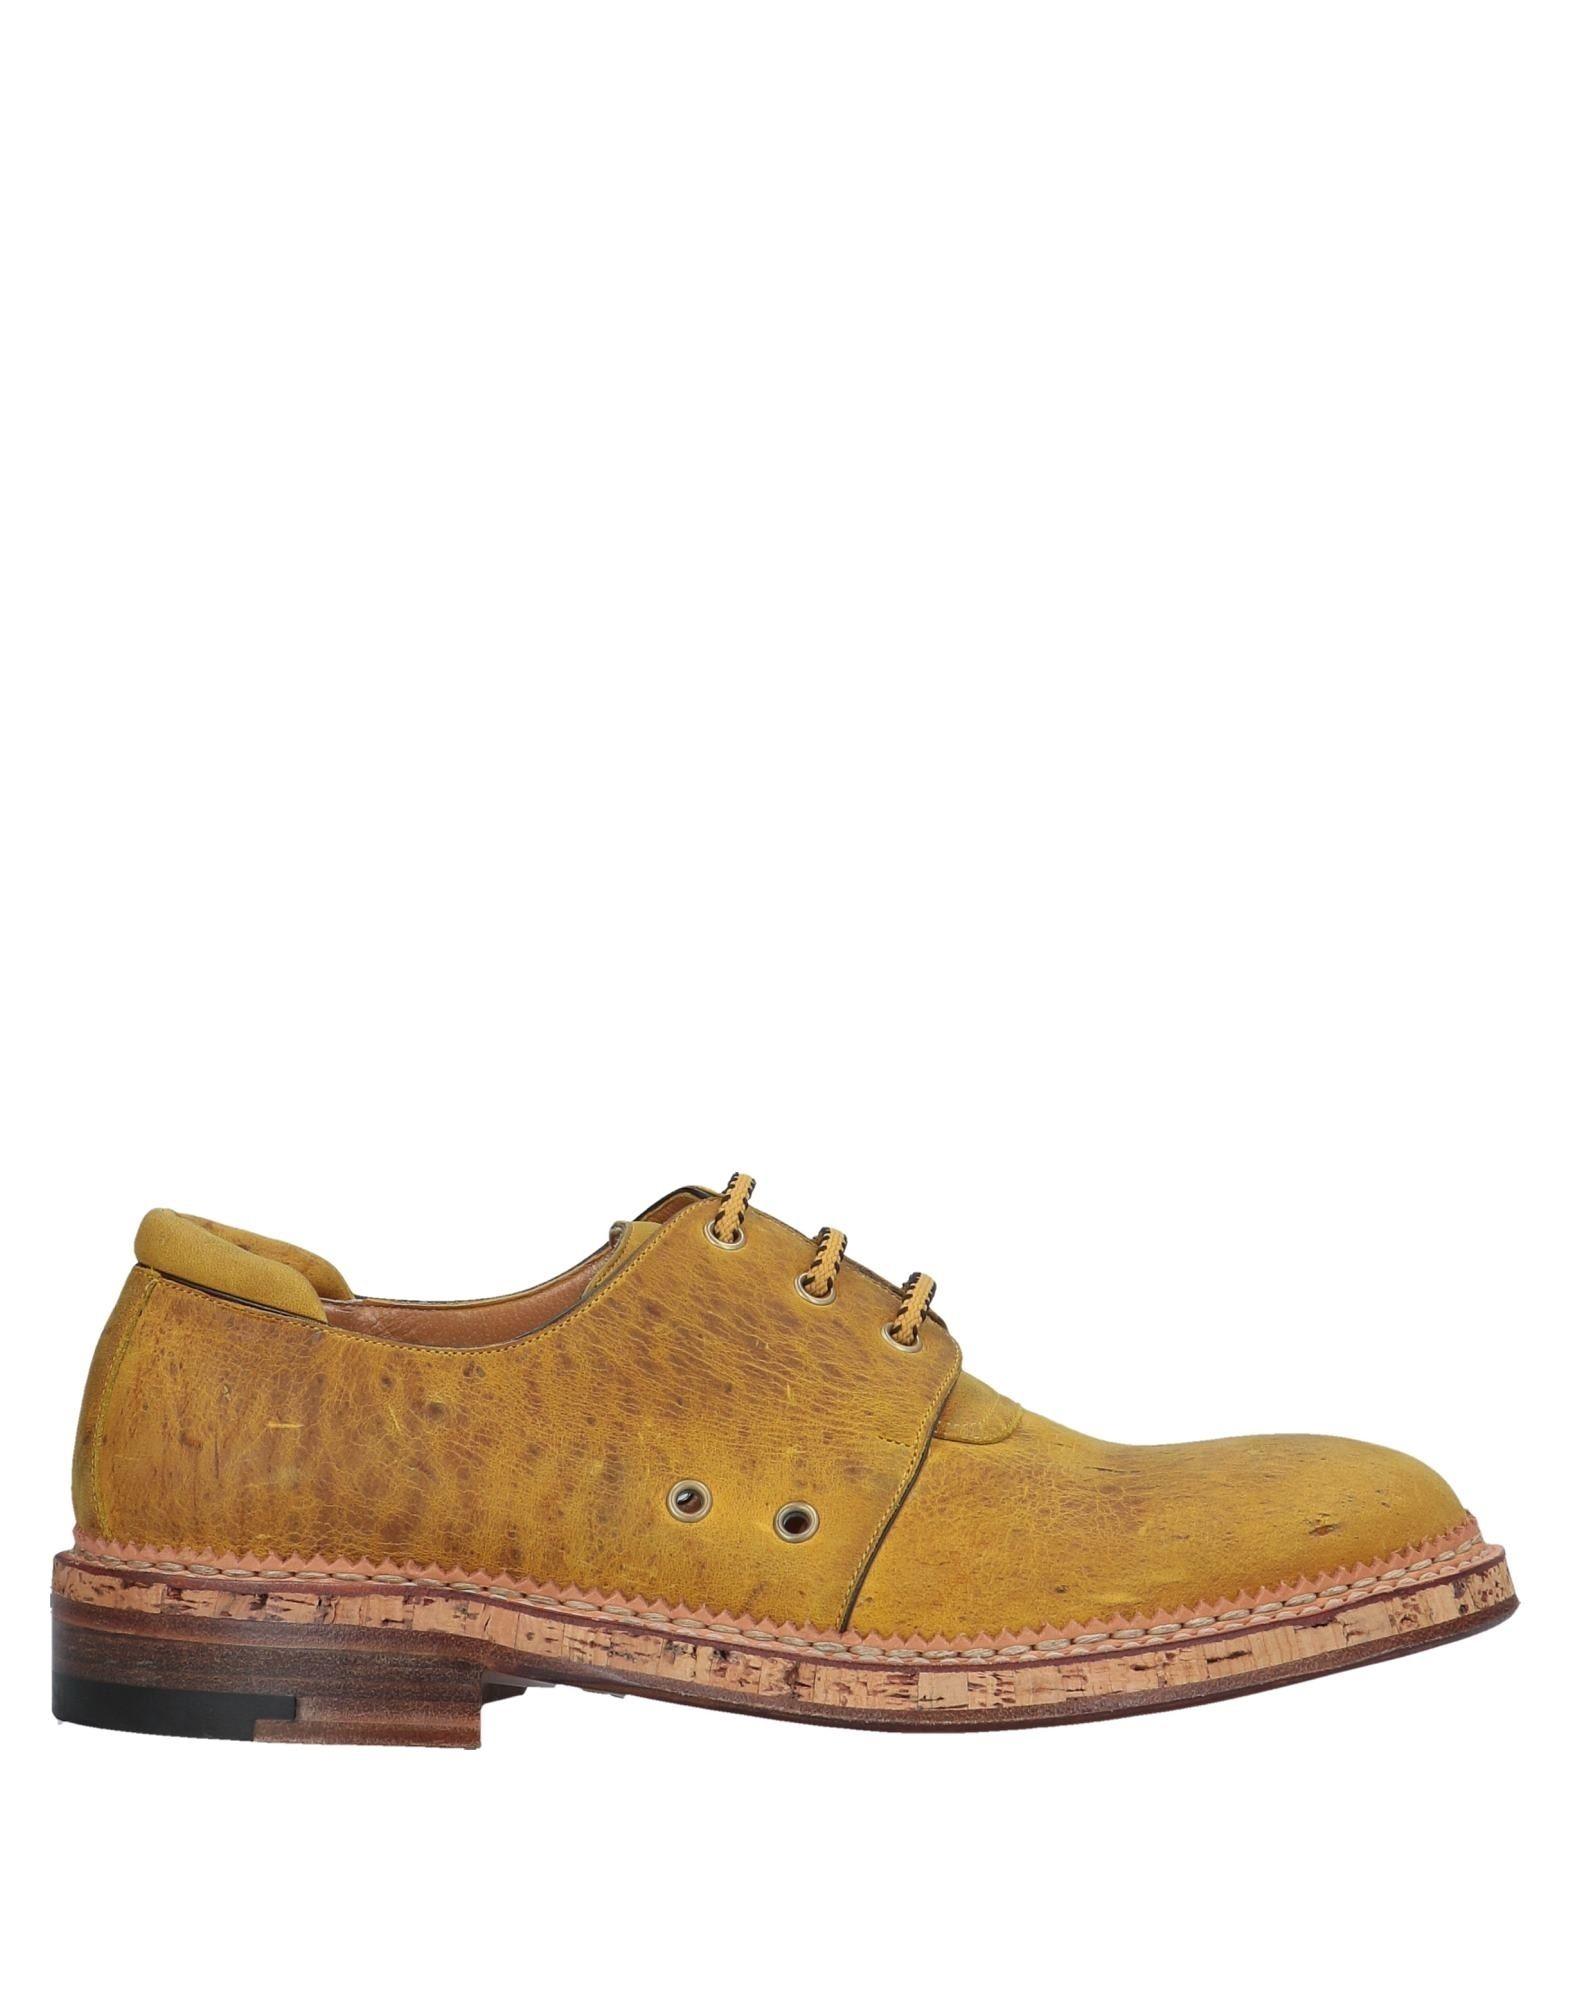 Фото - A.TESTONI Обувь на шнурках обувь на высокой платформе dkny